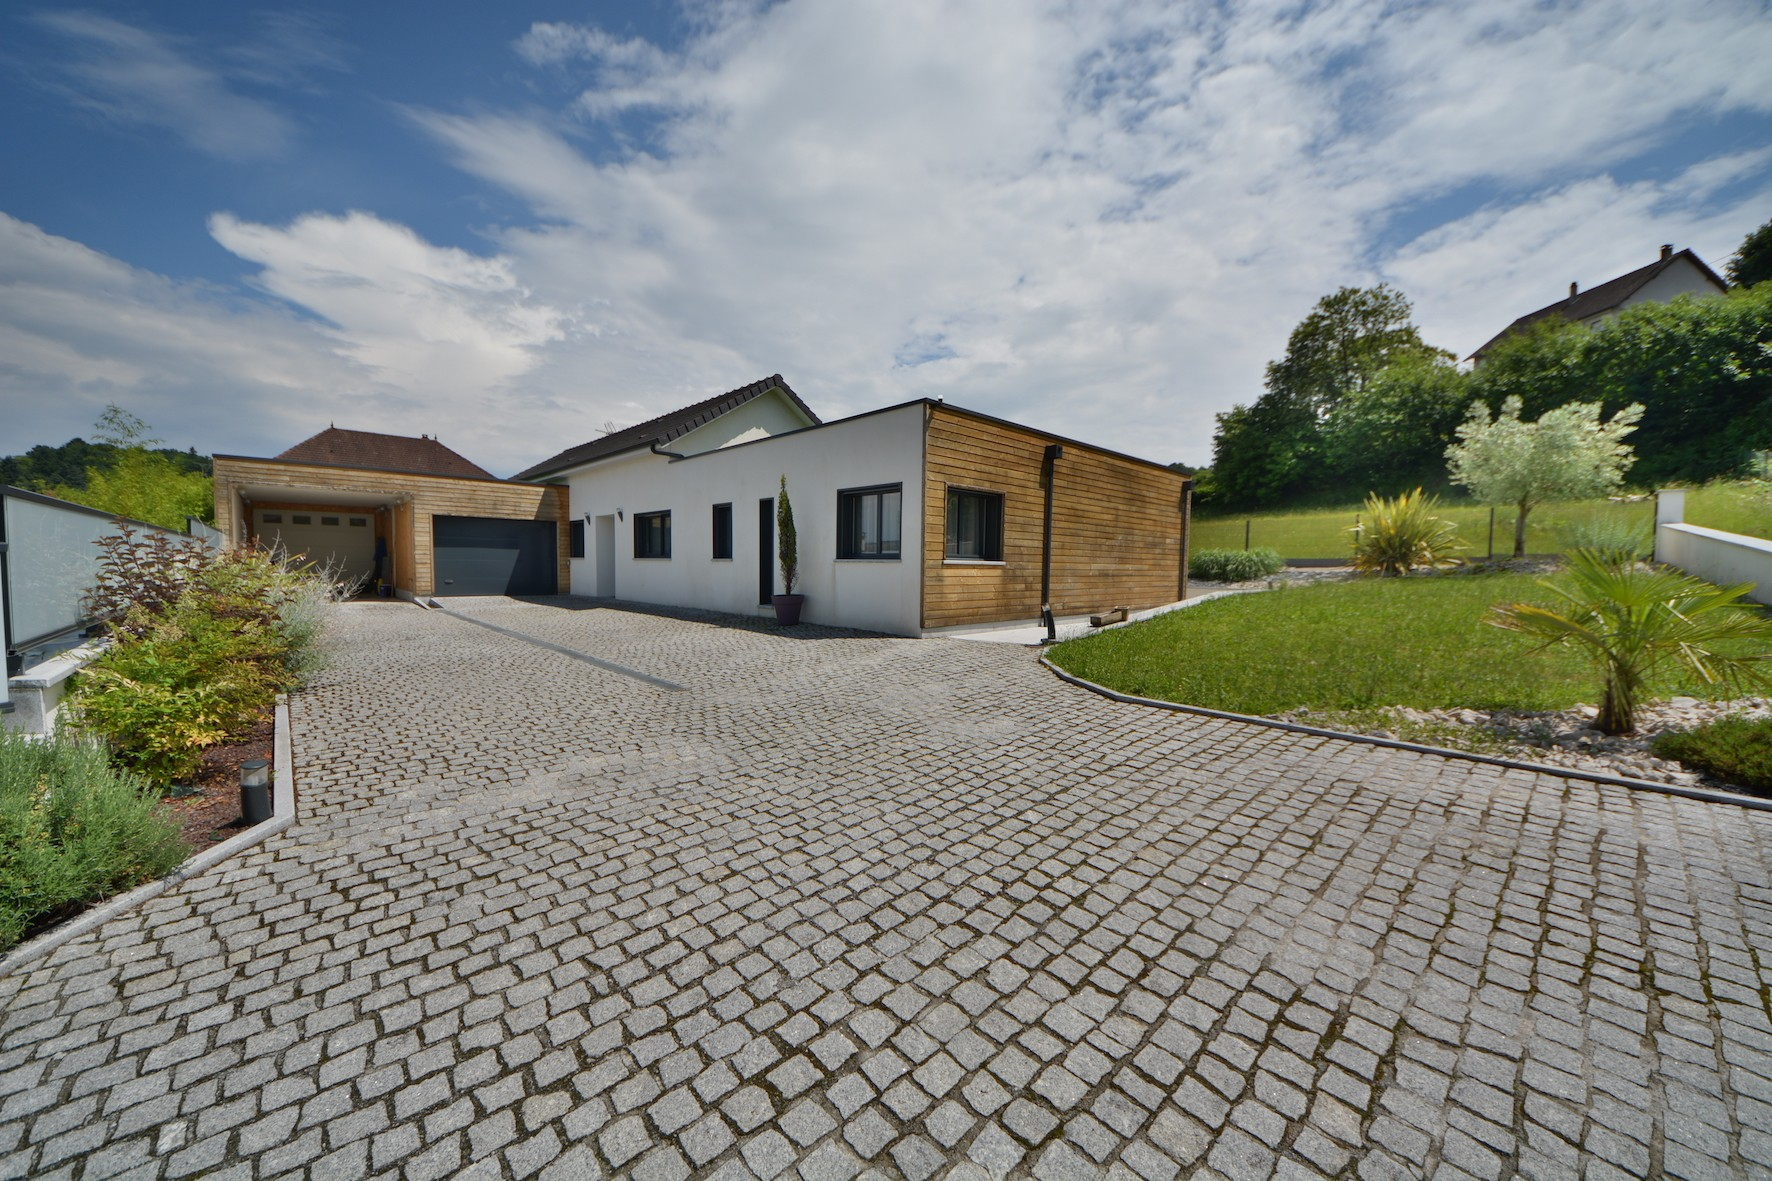 Maison a brive ventana blog for Architecte brive la gaillarde